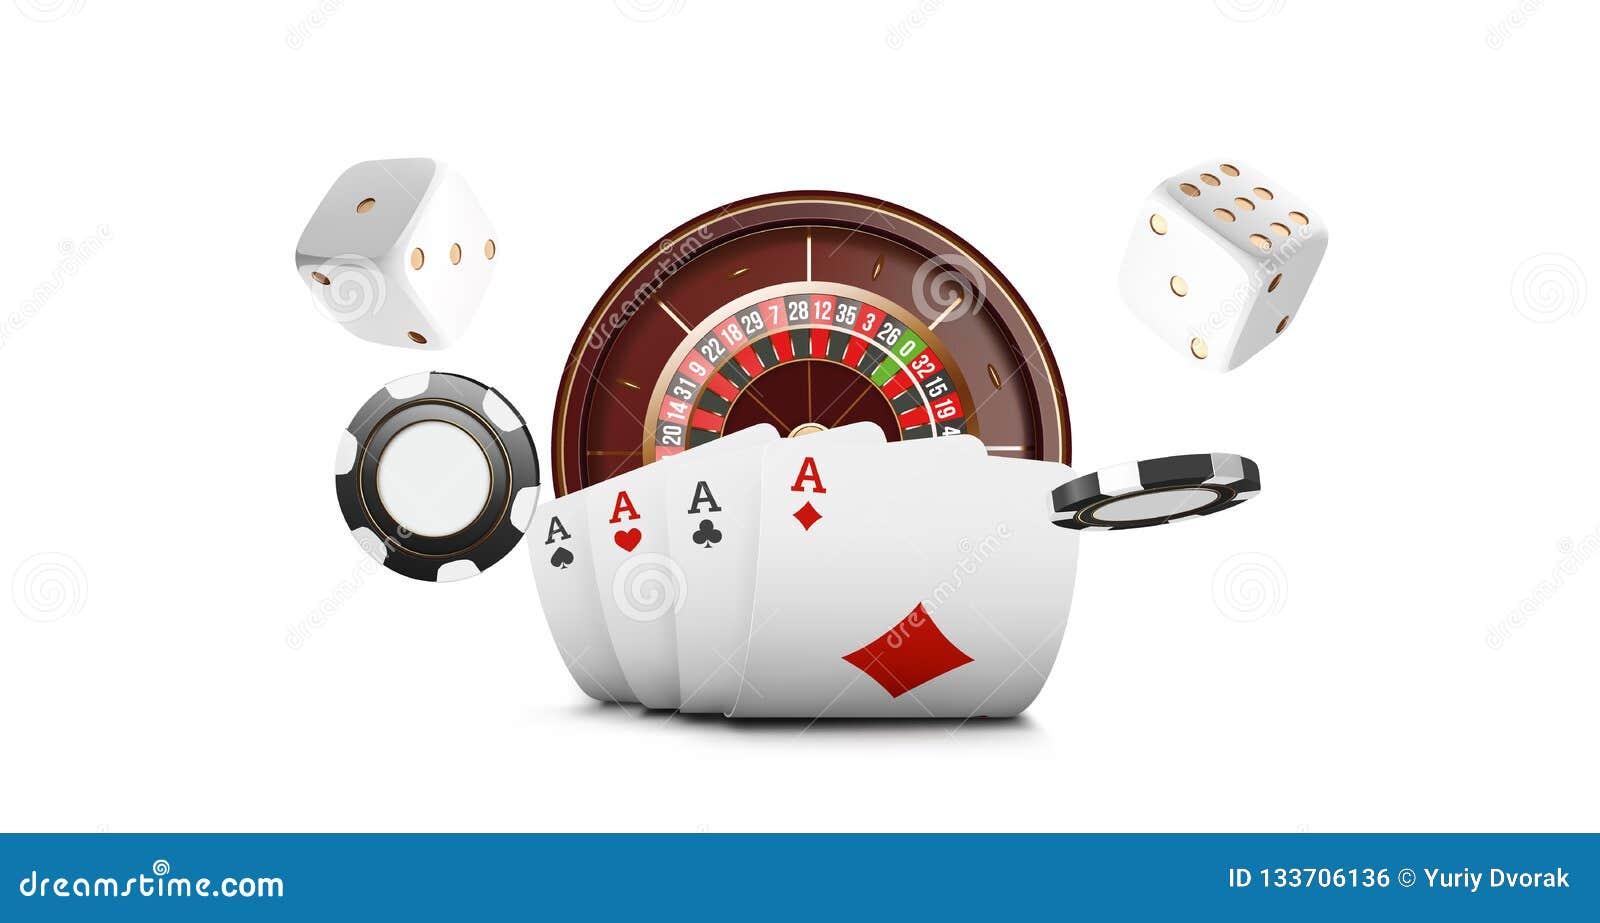 games gambling system card aviation